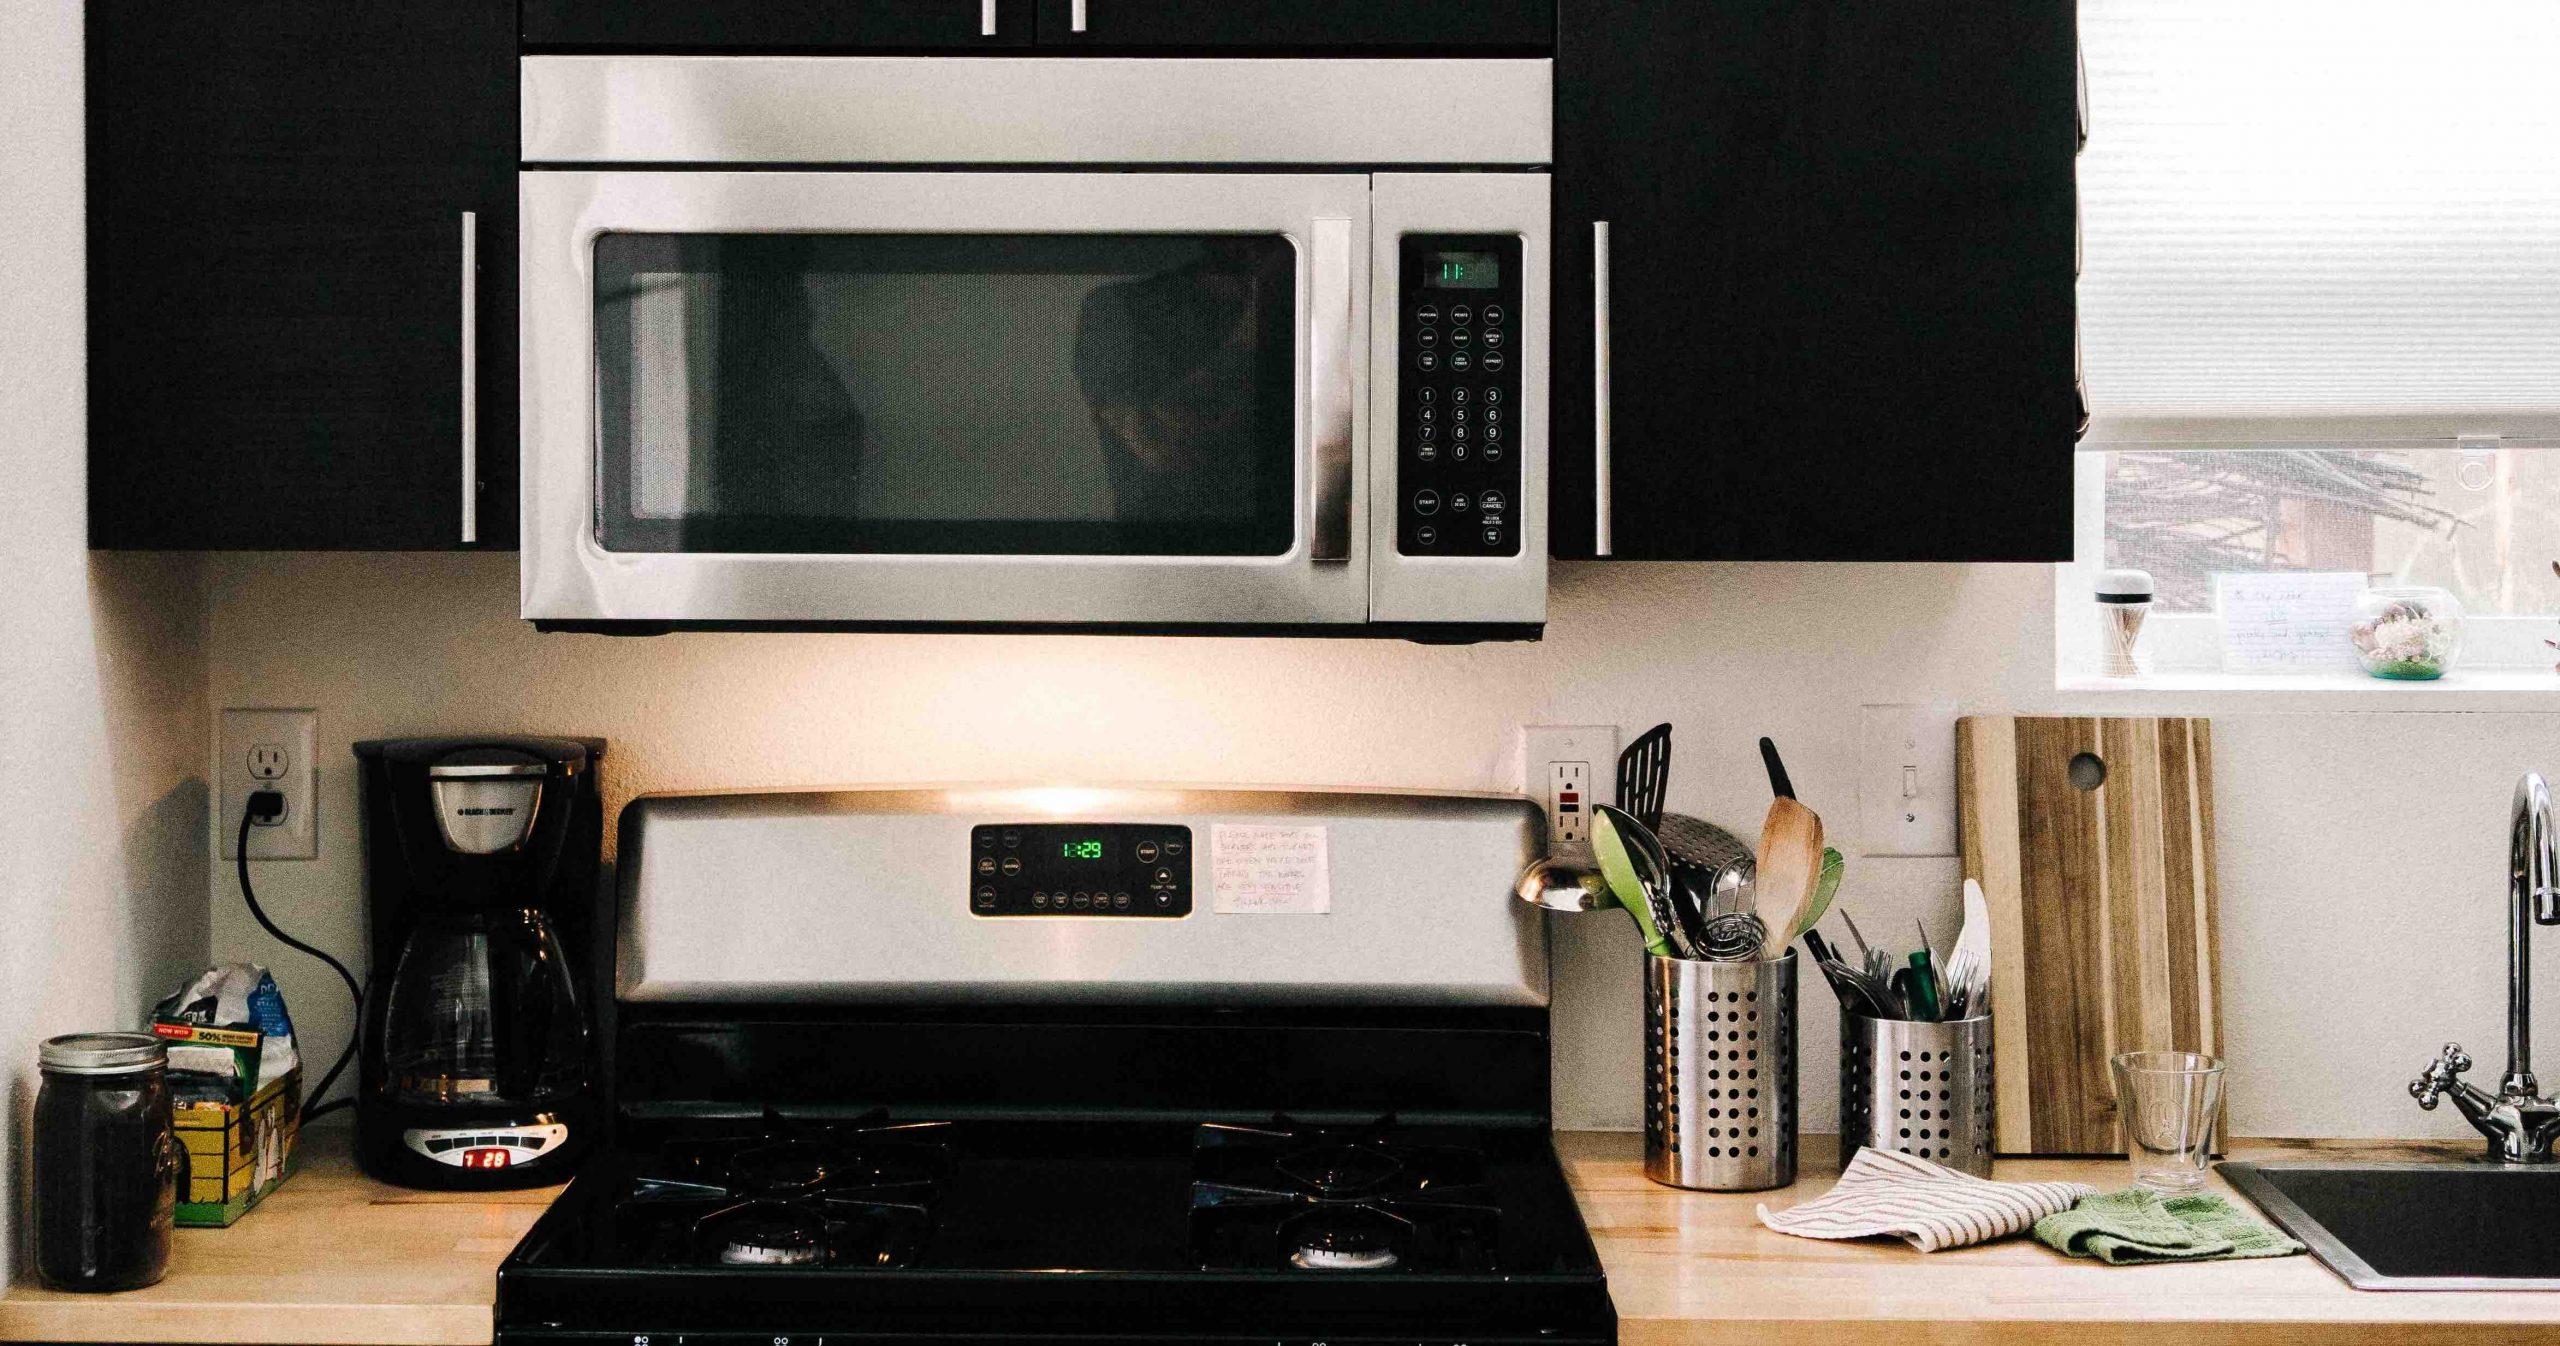 Panasonic Mikrowelle: Test & Empfehlungen (10/20)